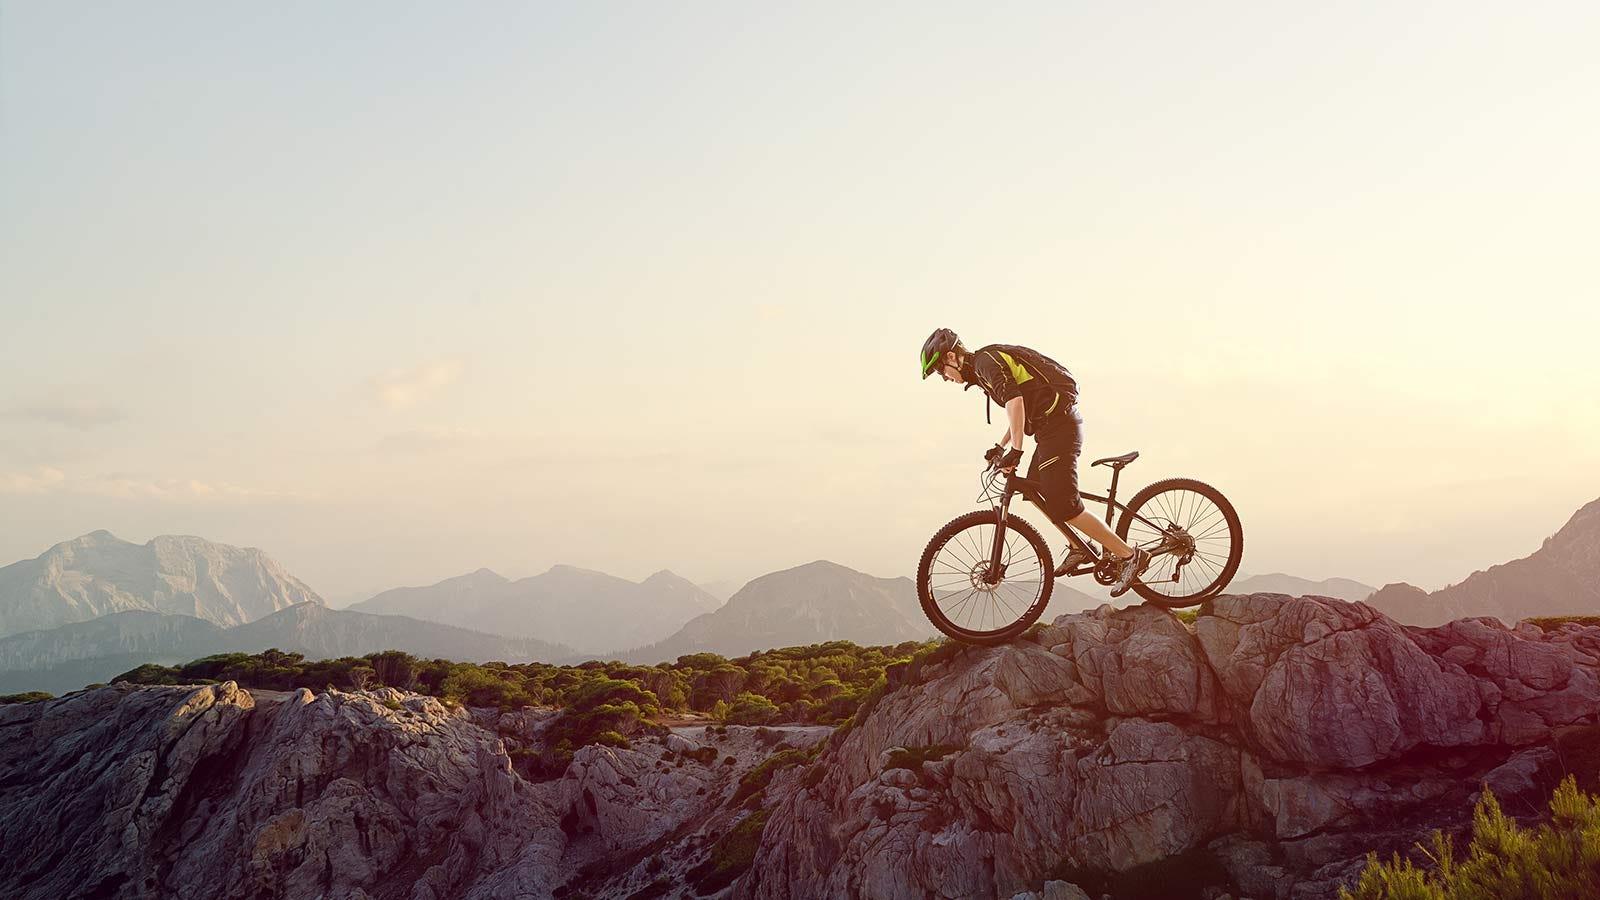 A man carefully riding his mountain bike along a rocky outcropping on a mountain slope.